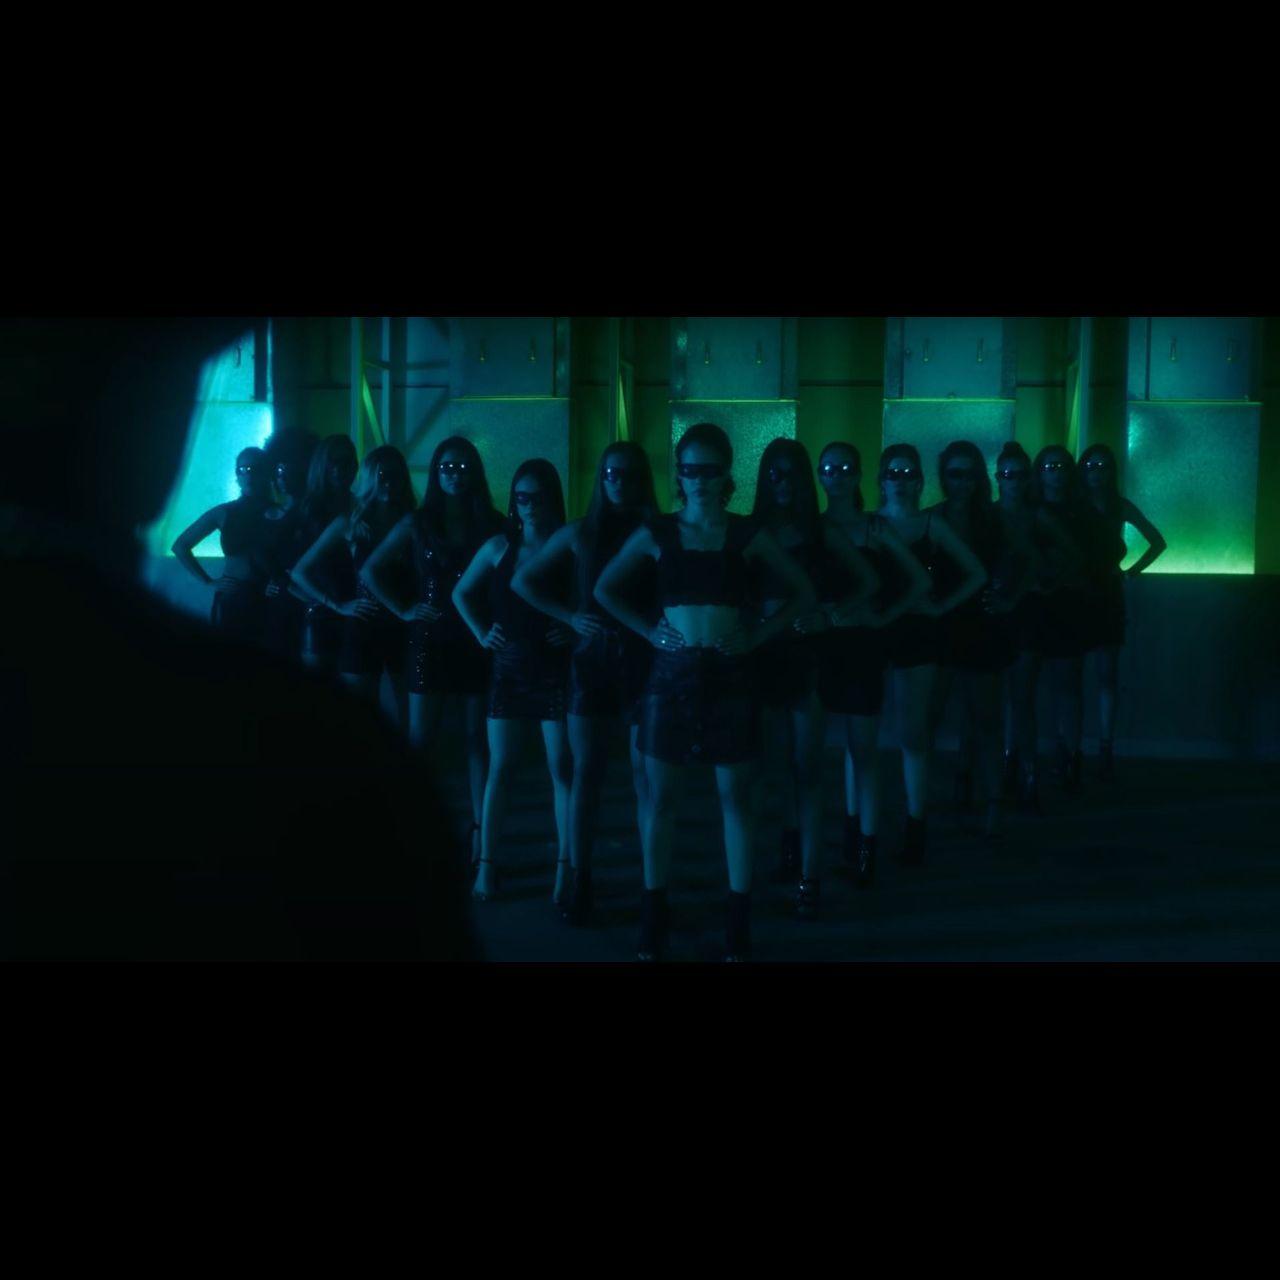 Tito El Bambino - No la dejes caer (Thumbnail)